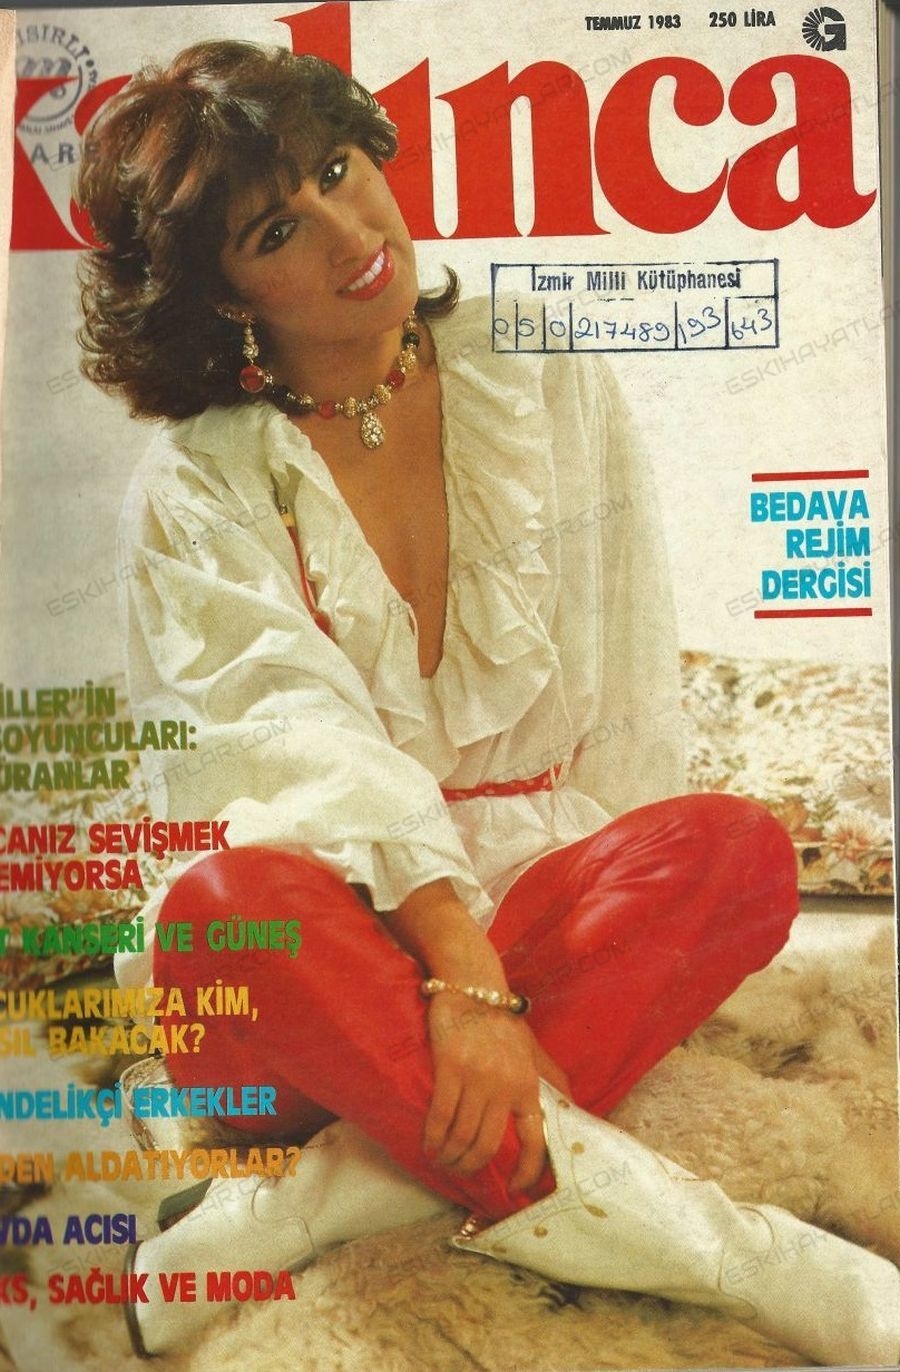 0162-nukhet-duru-gencligi-1983-kadinca-dergisi-kapagi